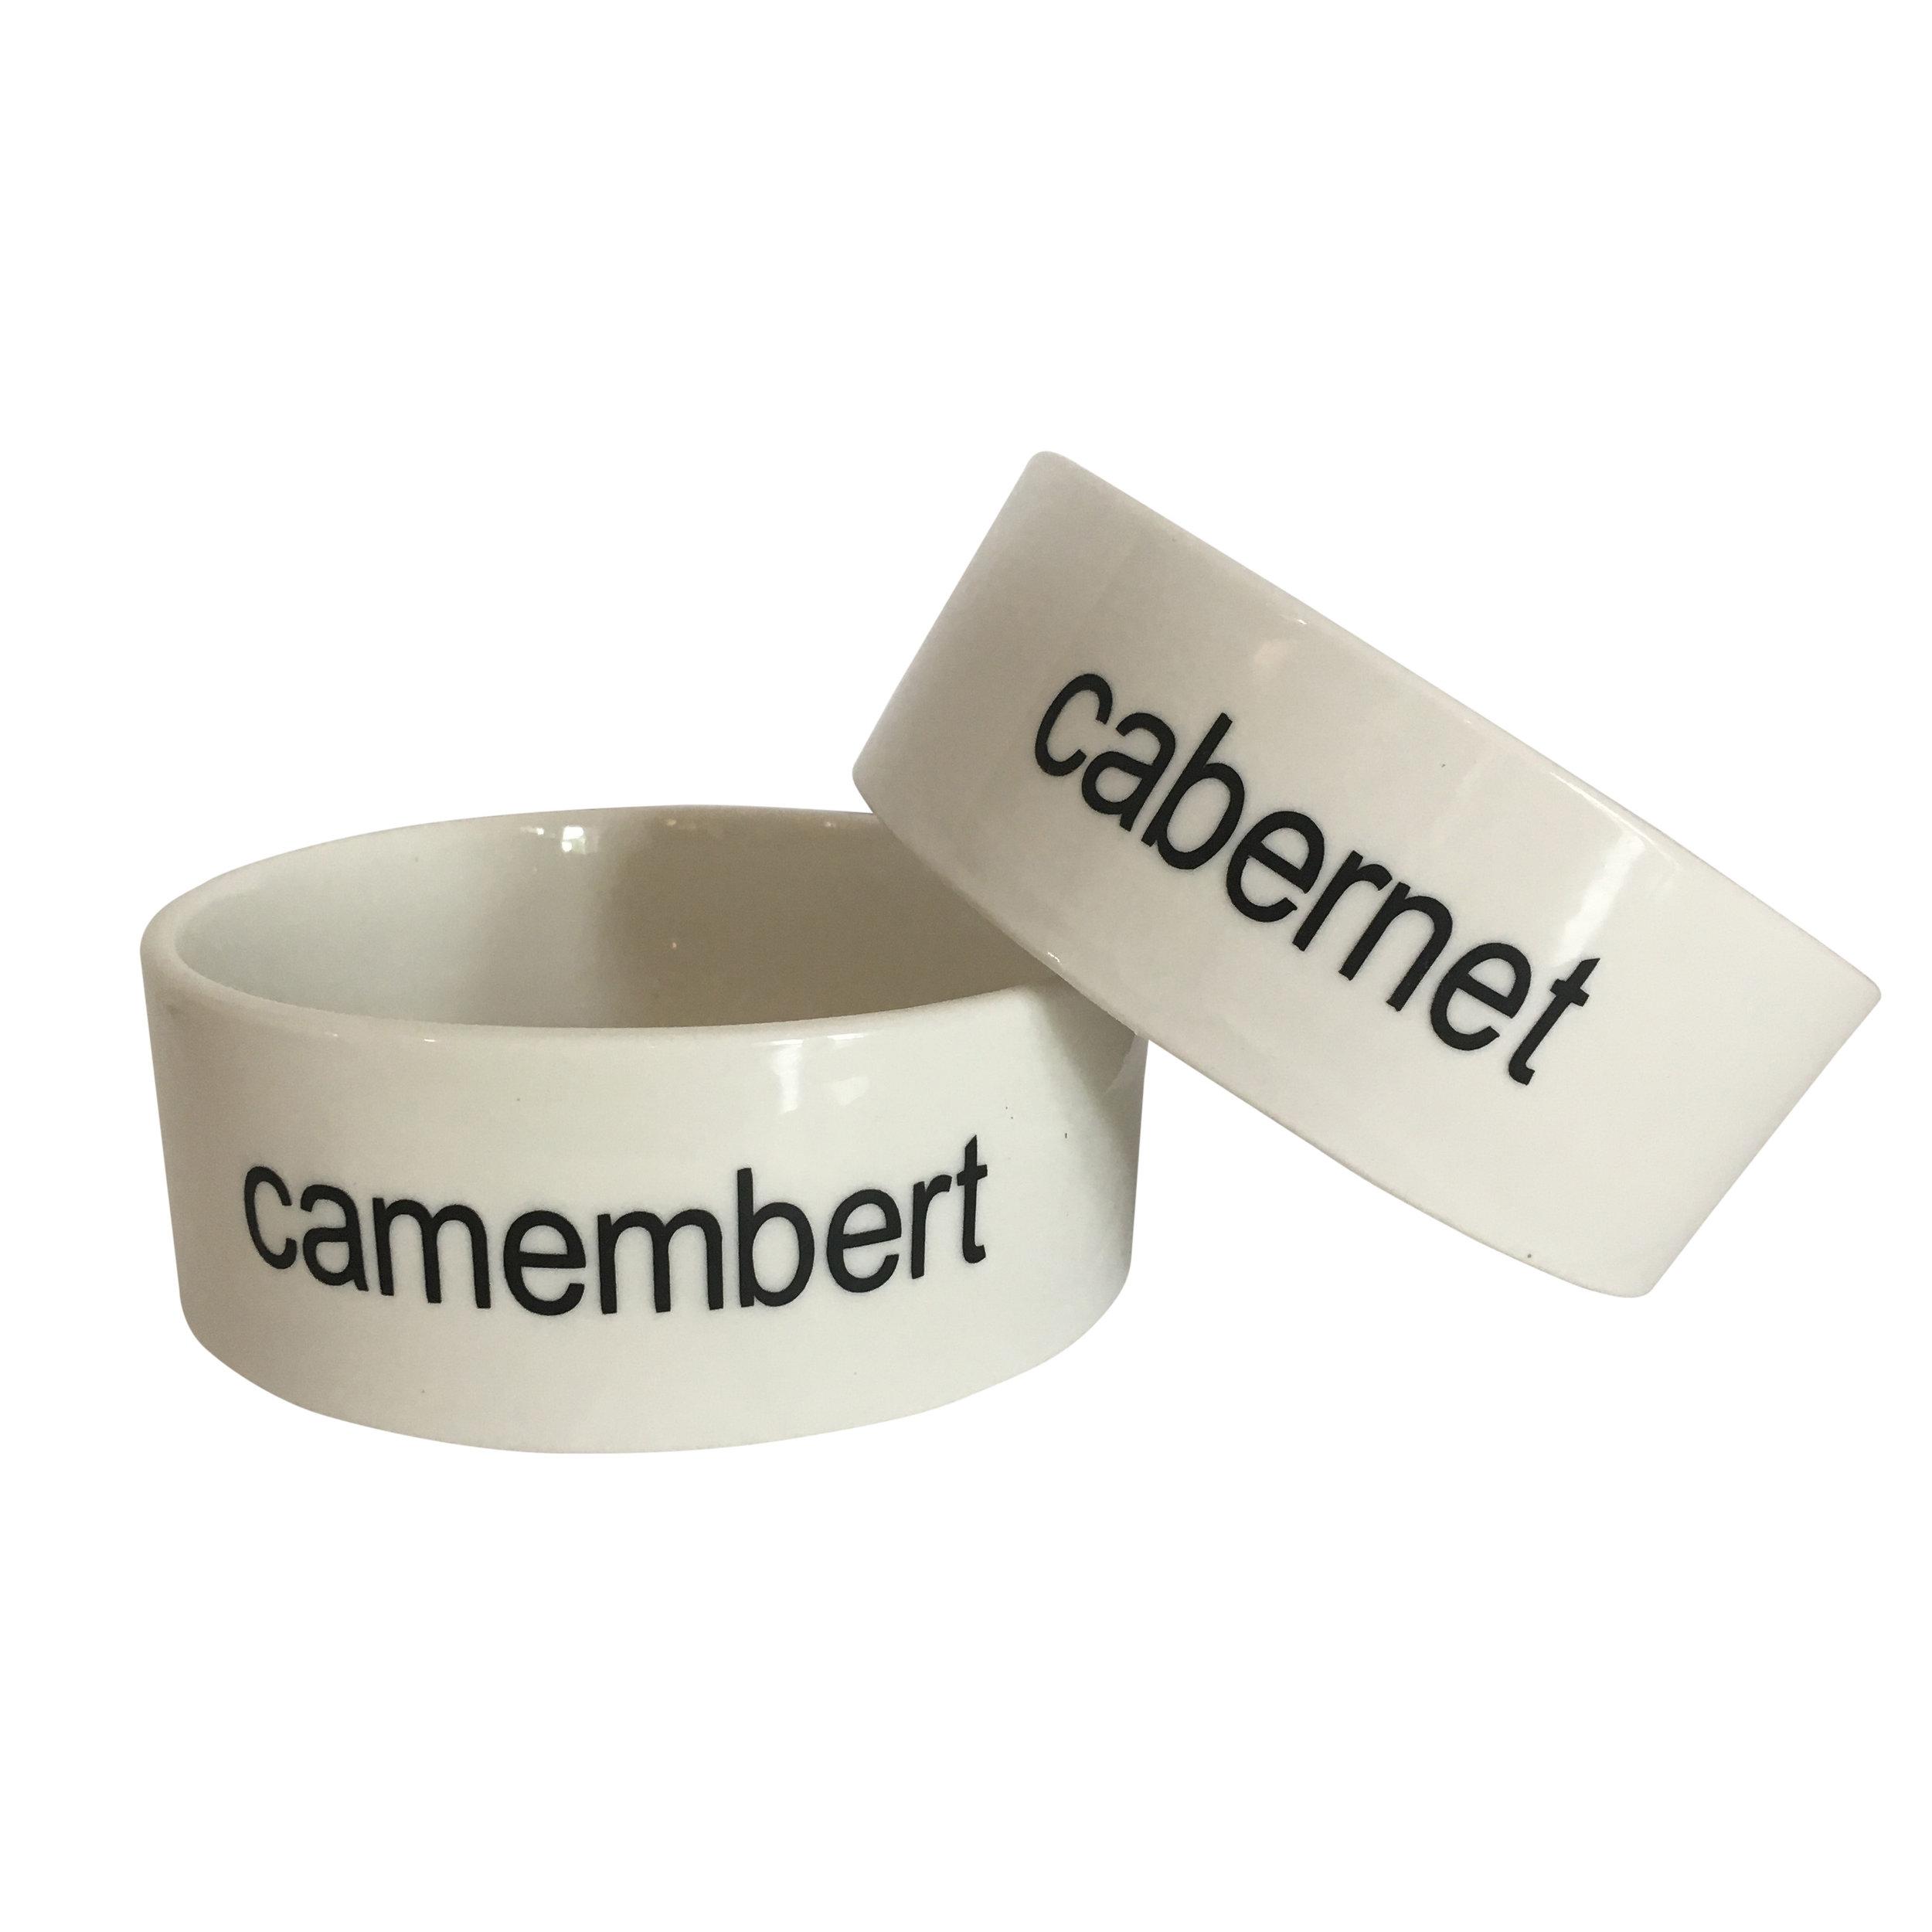 camembert and cabernet cat bowls